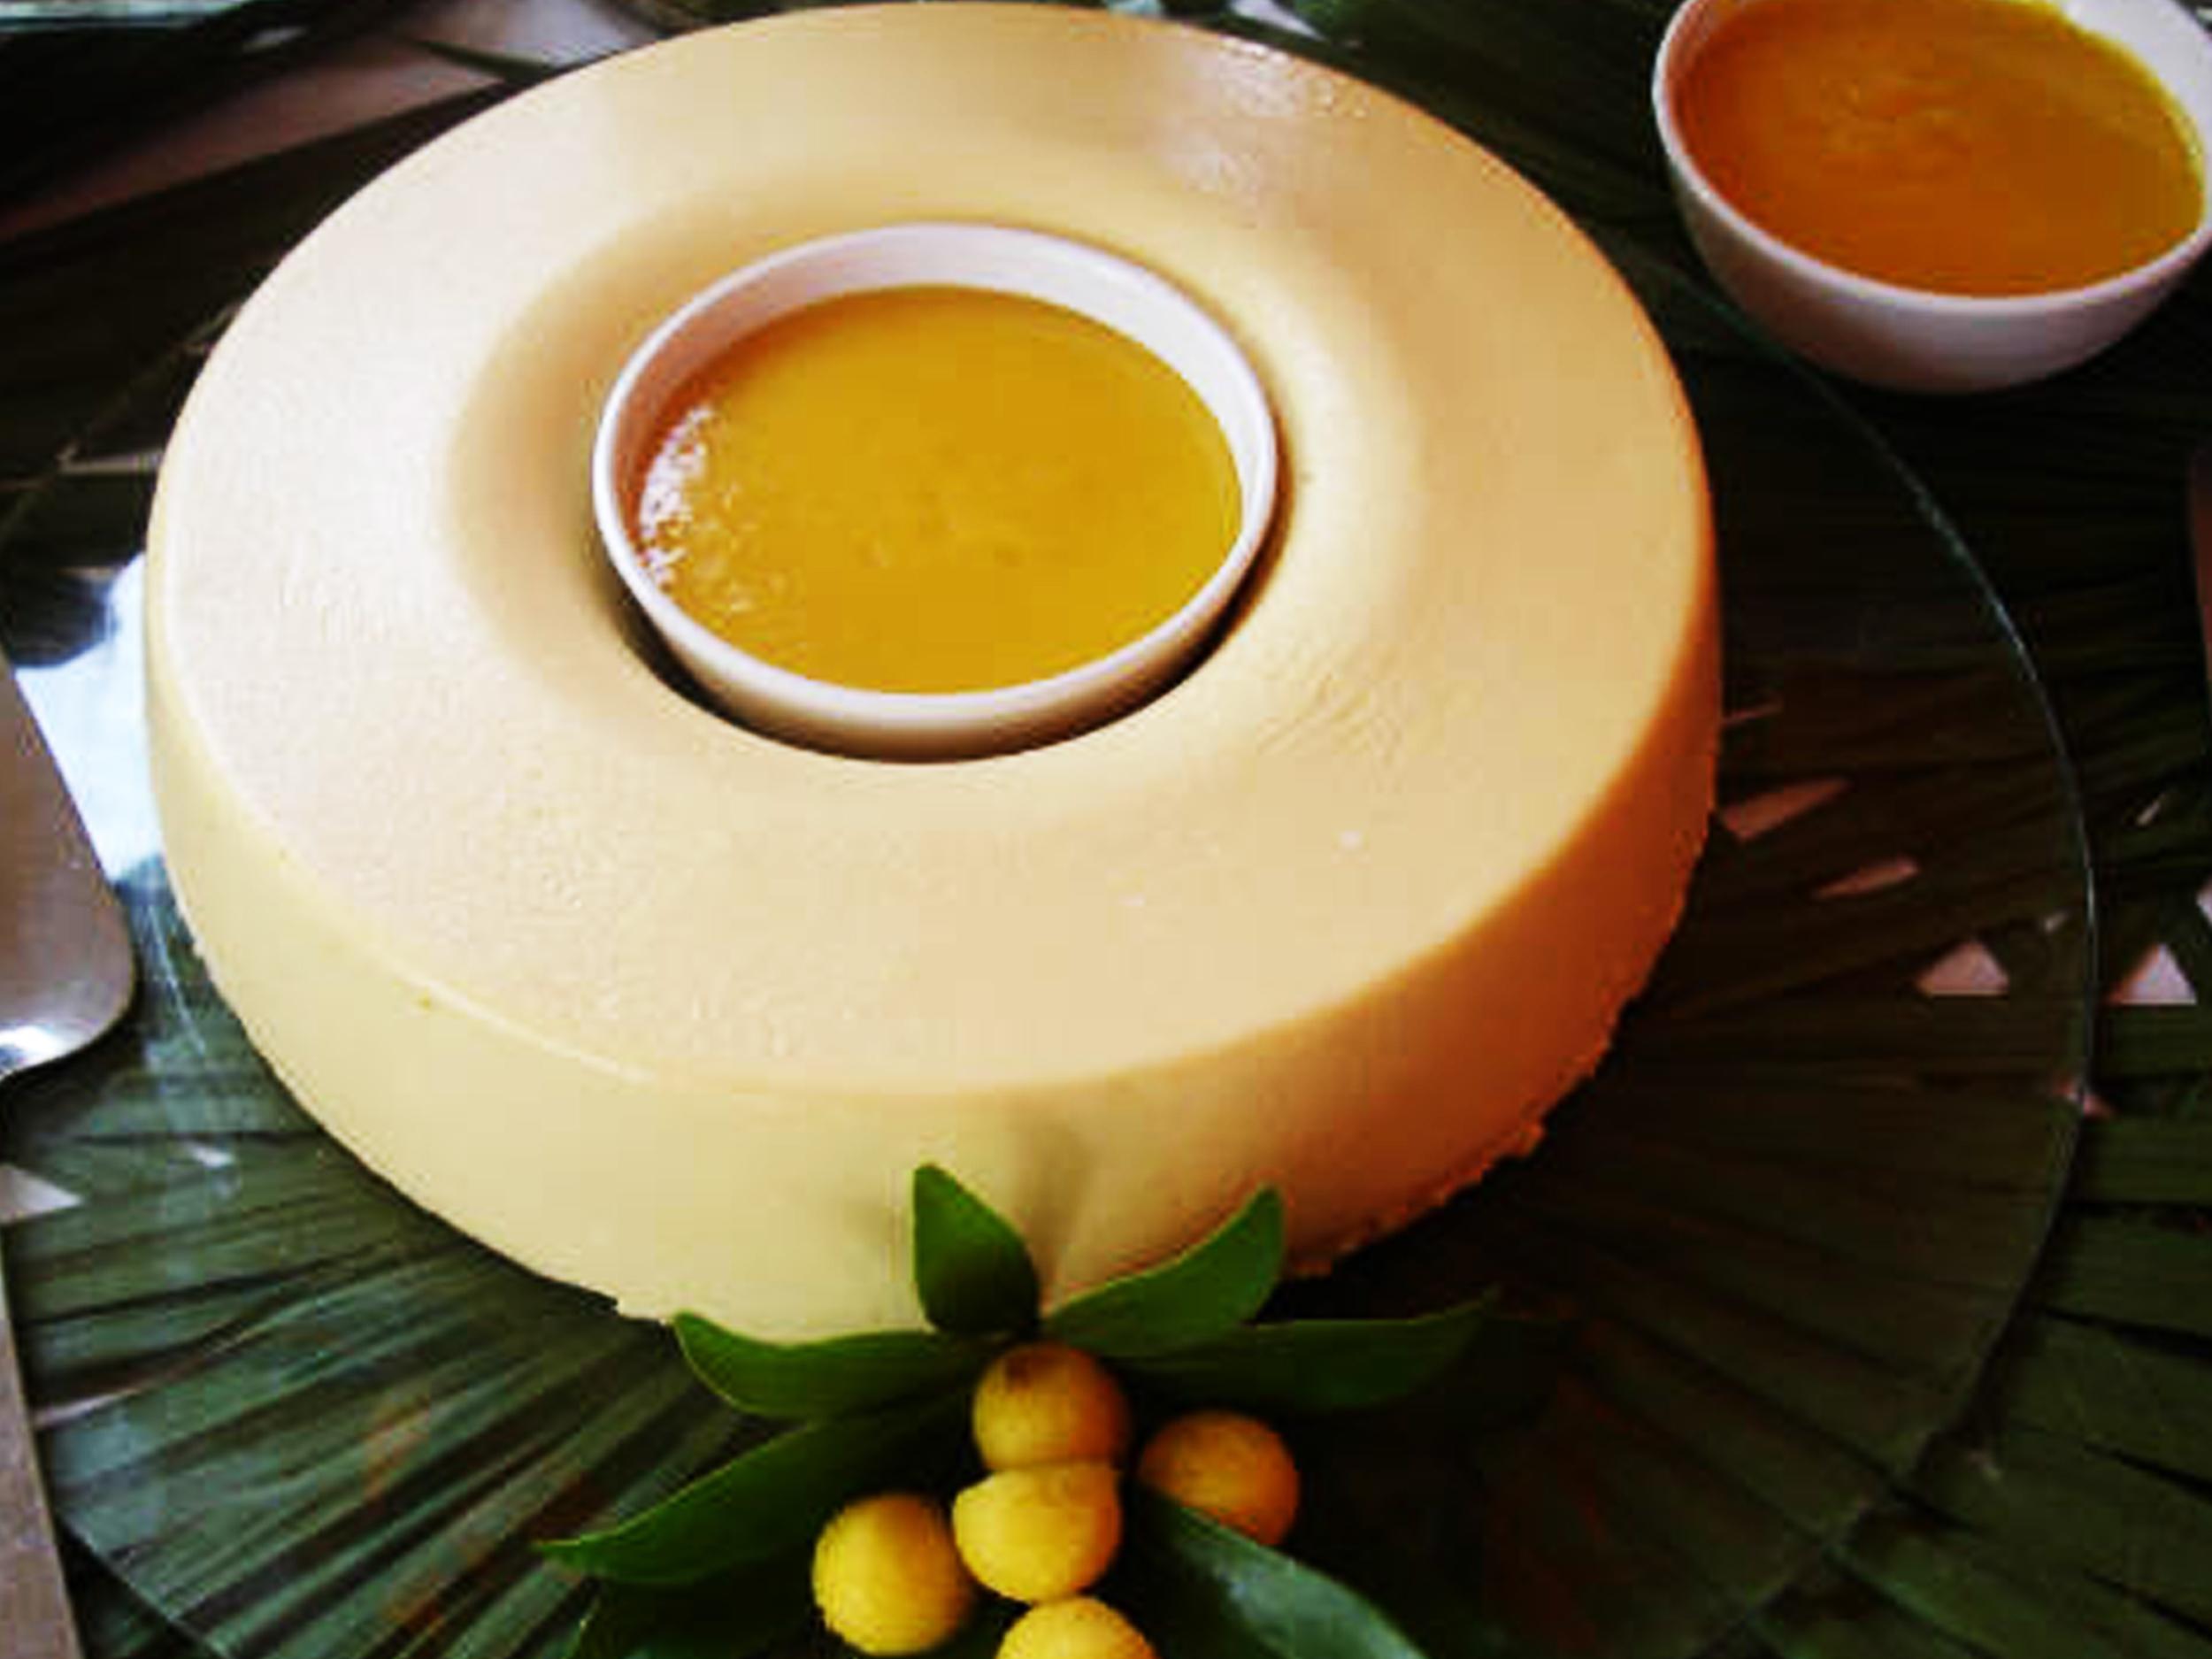 Mousse de Mango  Mousse de Mango con coulis de Mango con Amaretto. PRECIO: Chico $ 250.00 Grande $ 370.00